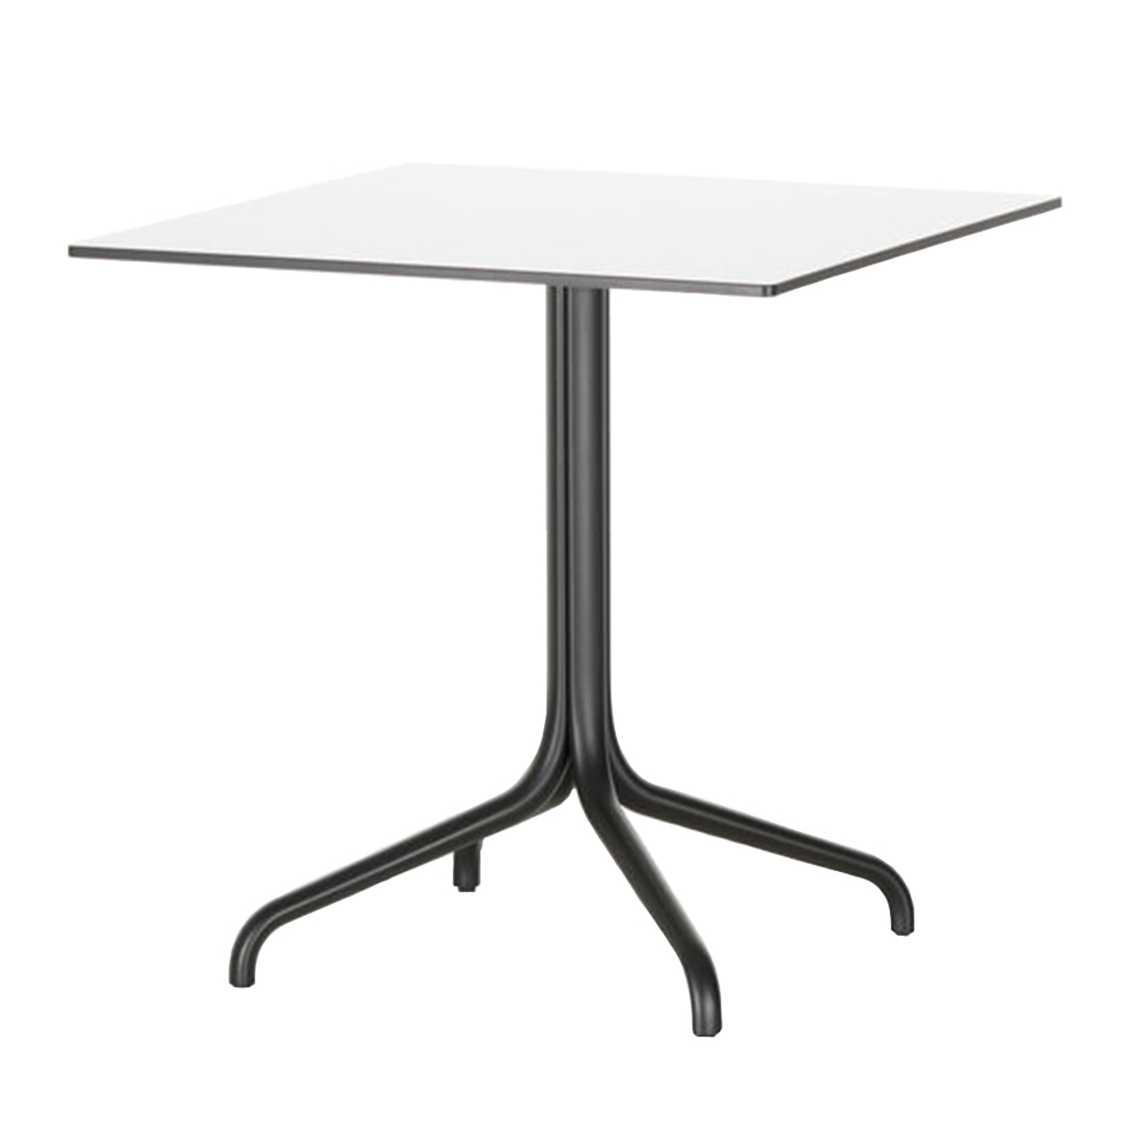 vierkante-eettafel-vitra-belleville-tafel-volkern-wit-vierkant-outdoor_1_1